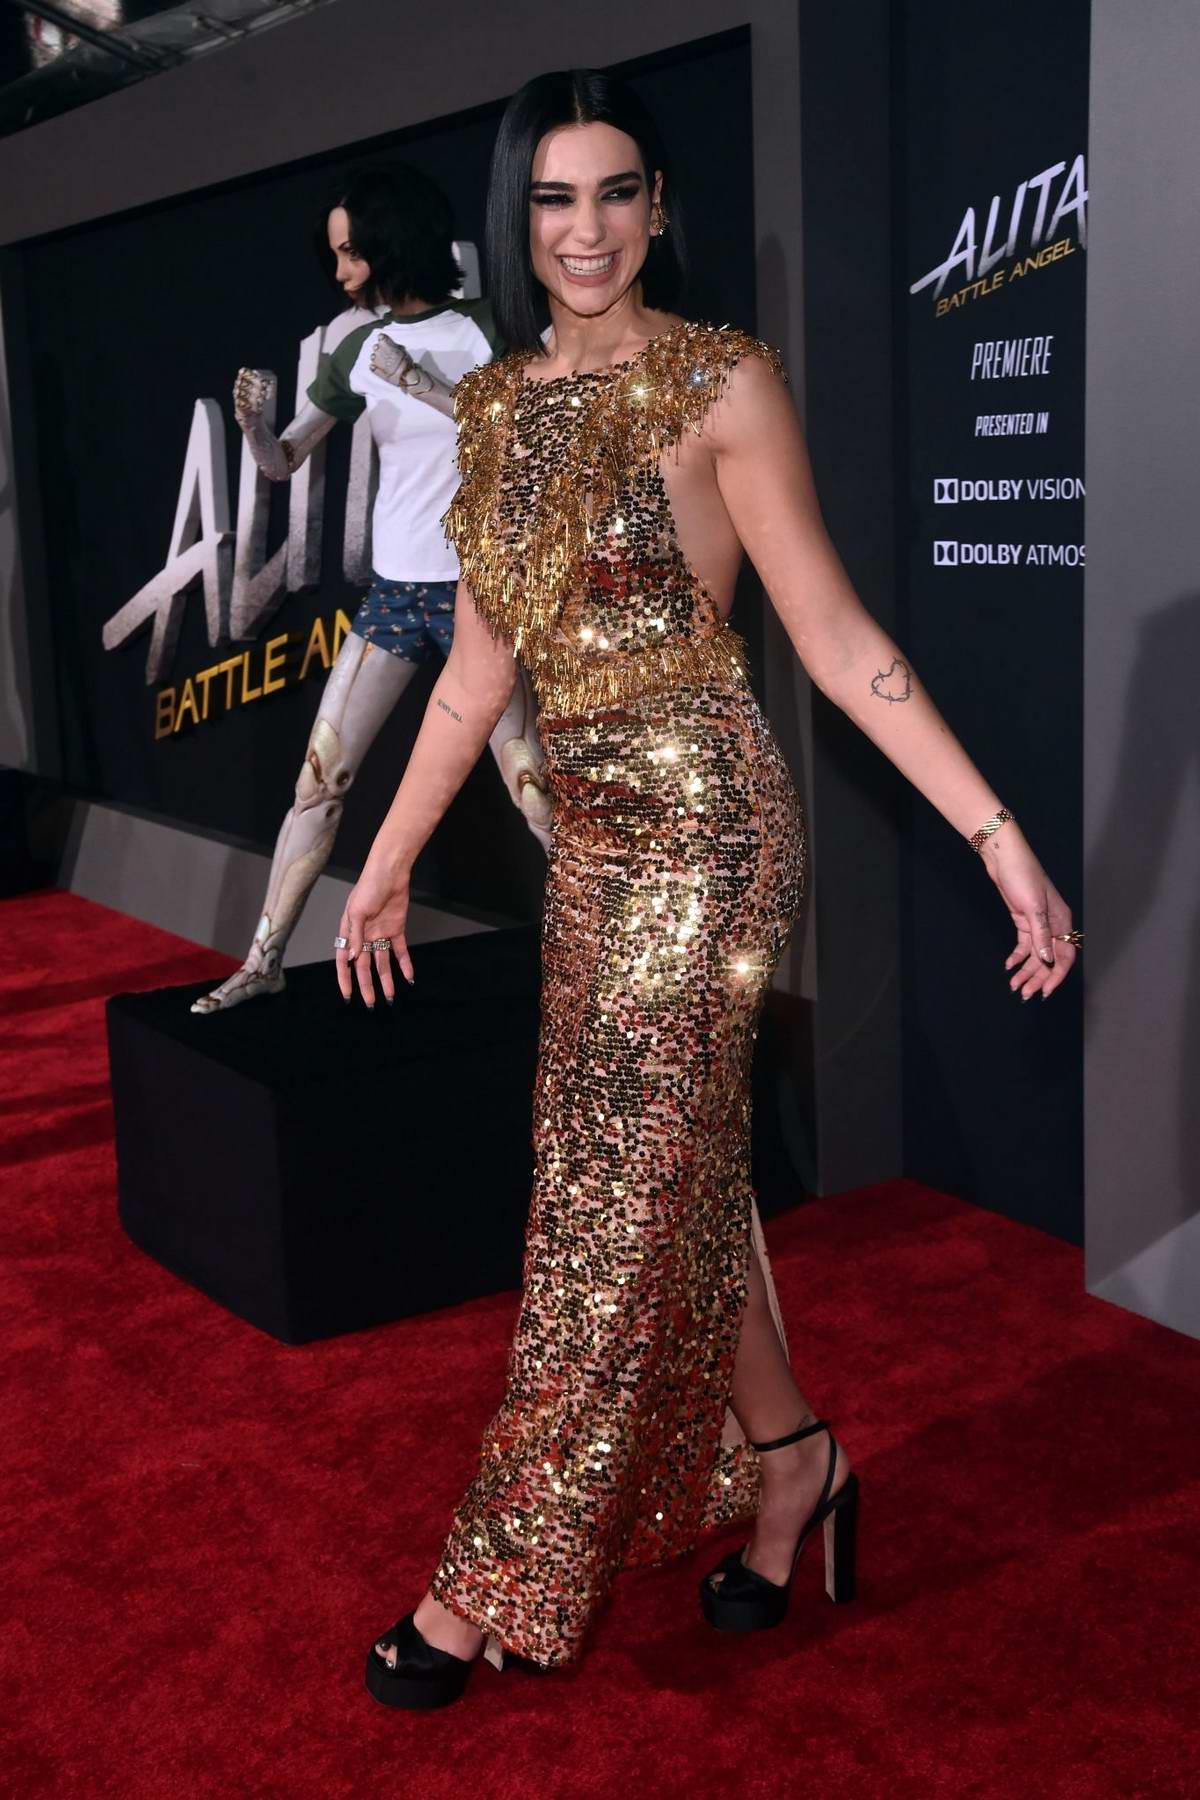 Dua Lipa attends the World Premiere of 'Alita: Battle Angel' at Westwood Regency Theater in Los Angeles